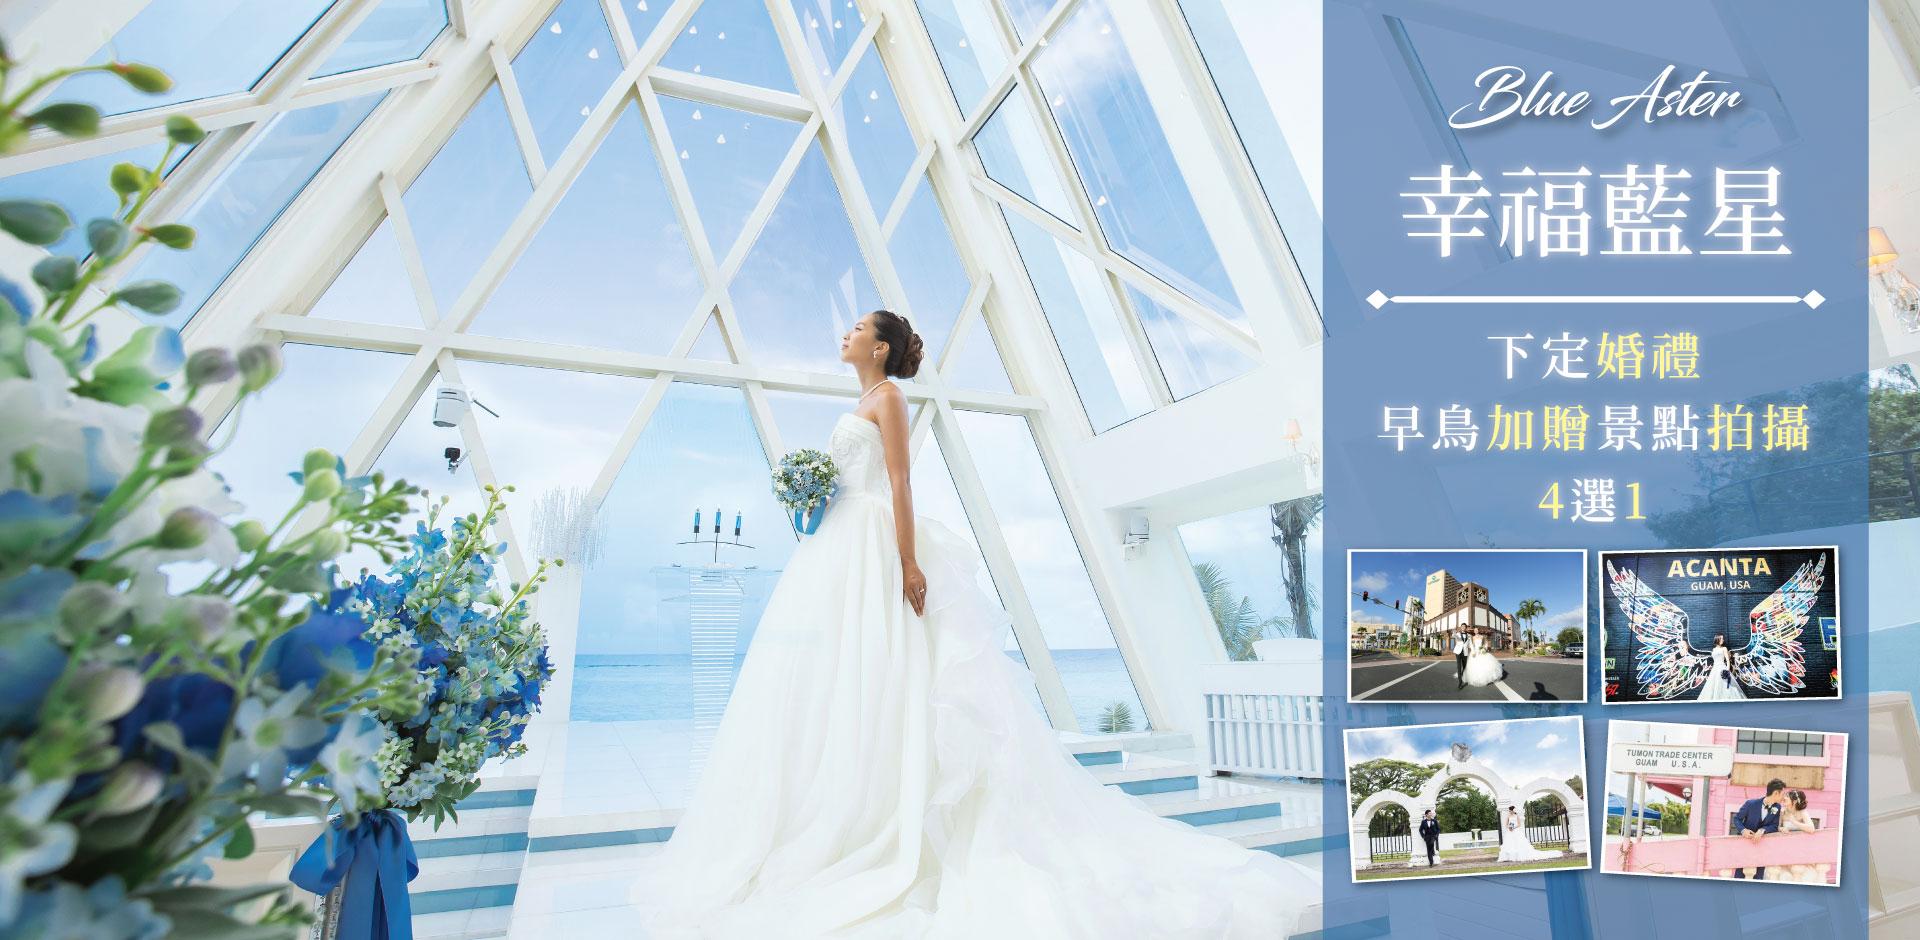 Guam wedding blueAster photo